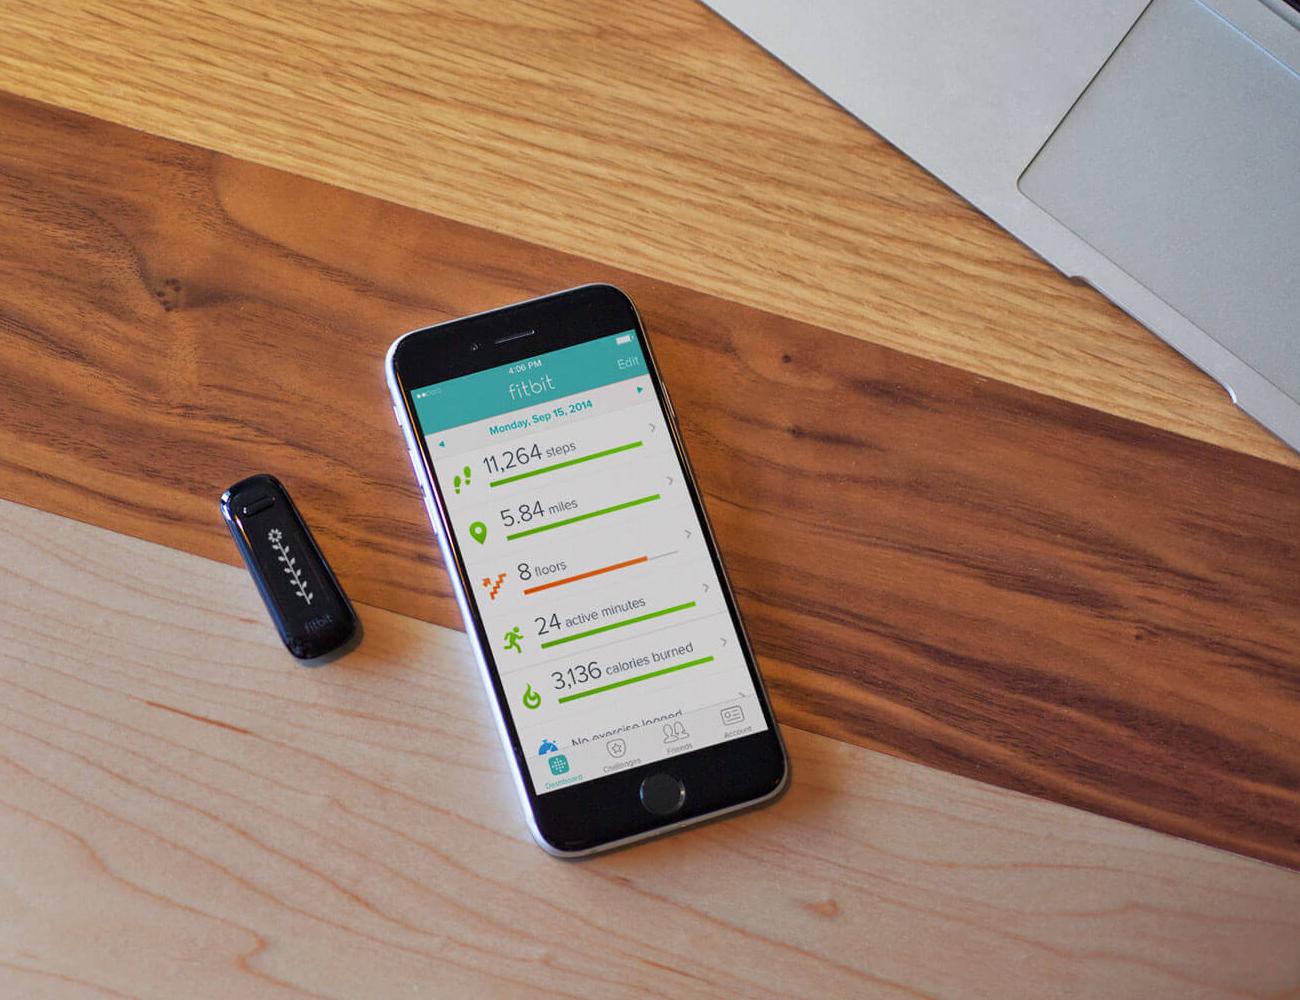 FitBit One Activity & Sleep Tracker